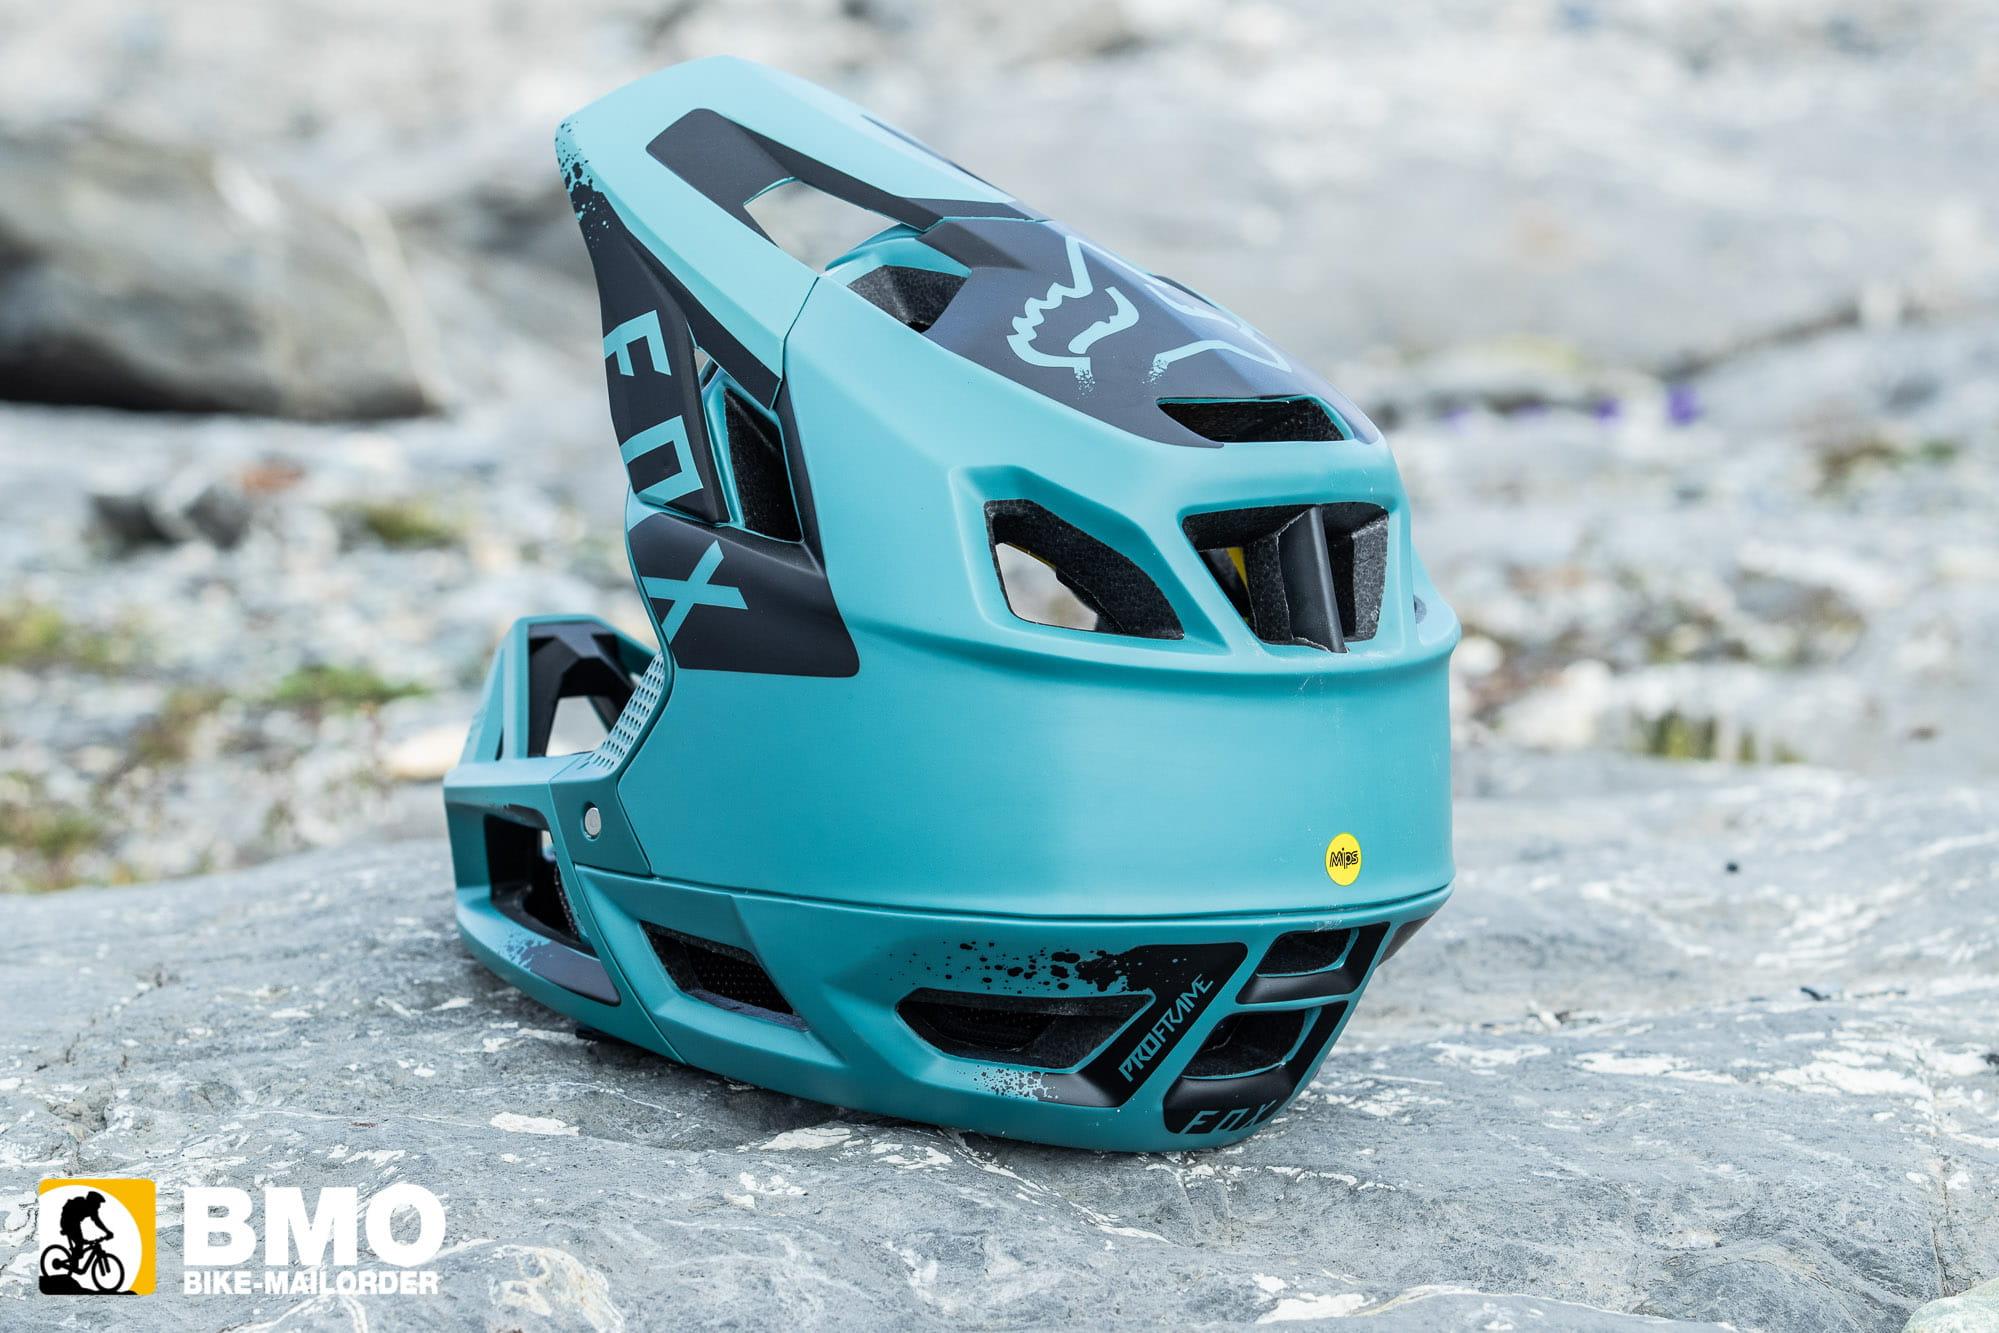 BMO-Bike-Mailorder-Fox-Proframe-3